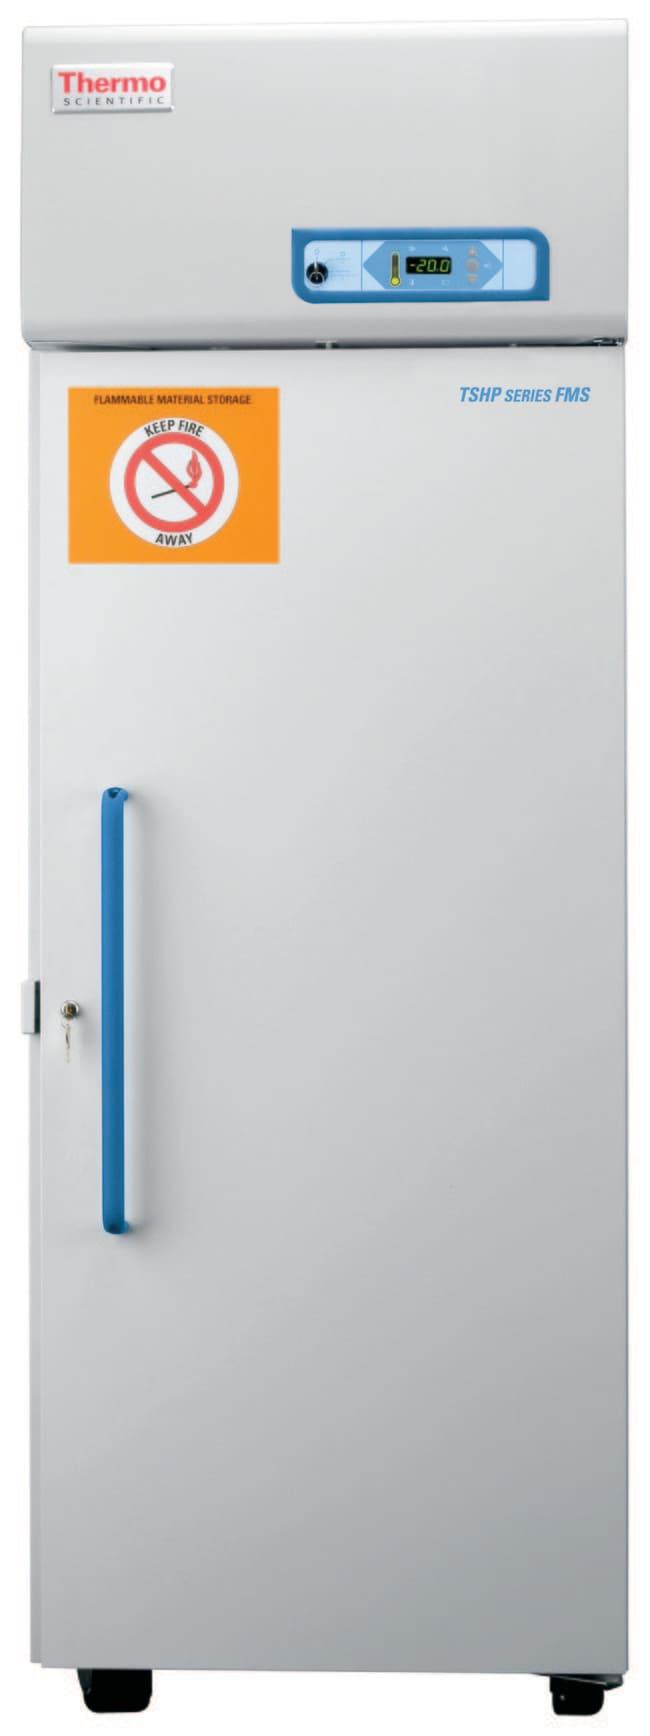 Thermo ScientificTSHP FMS High-Performance Laboratory Freezer, -20C; 23